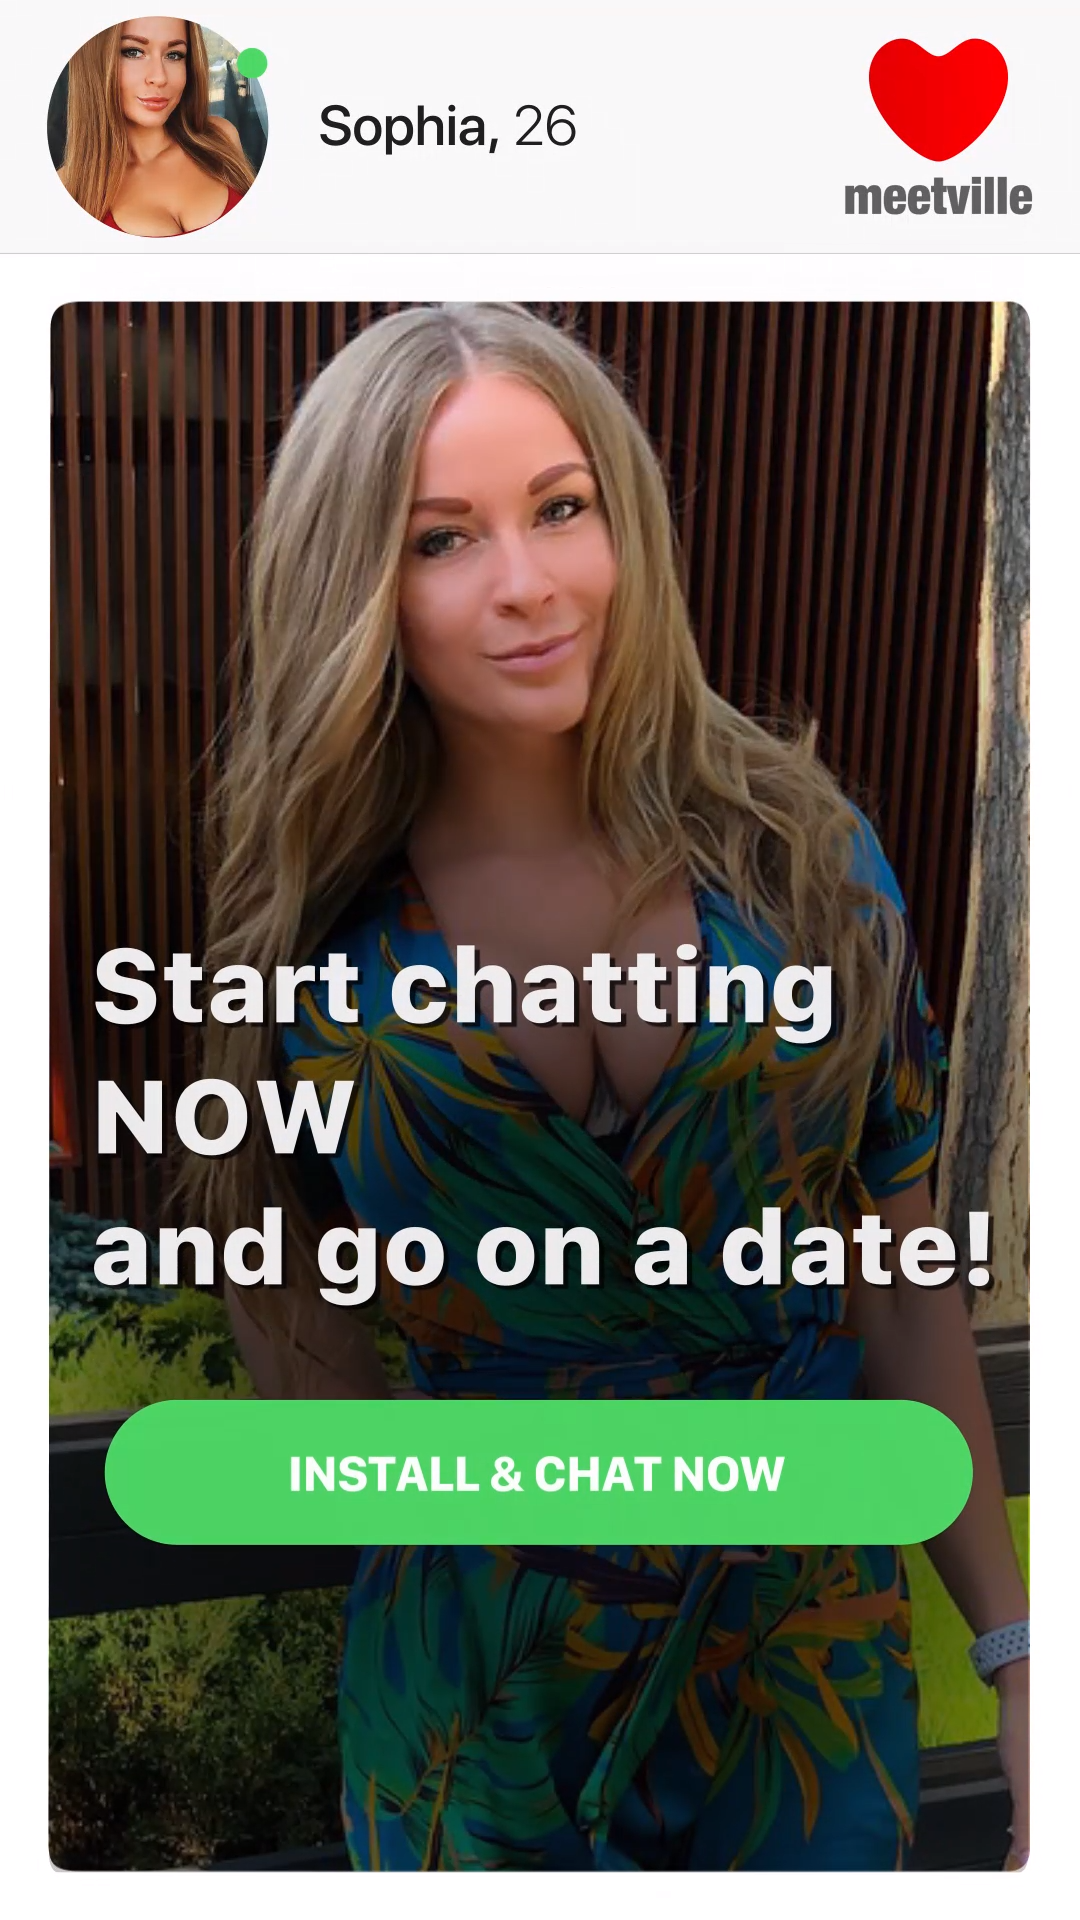 snabb Dating Chat